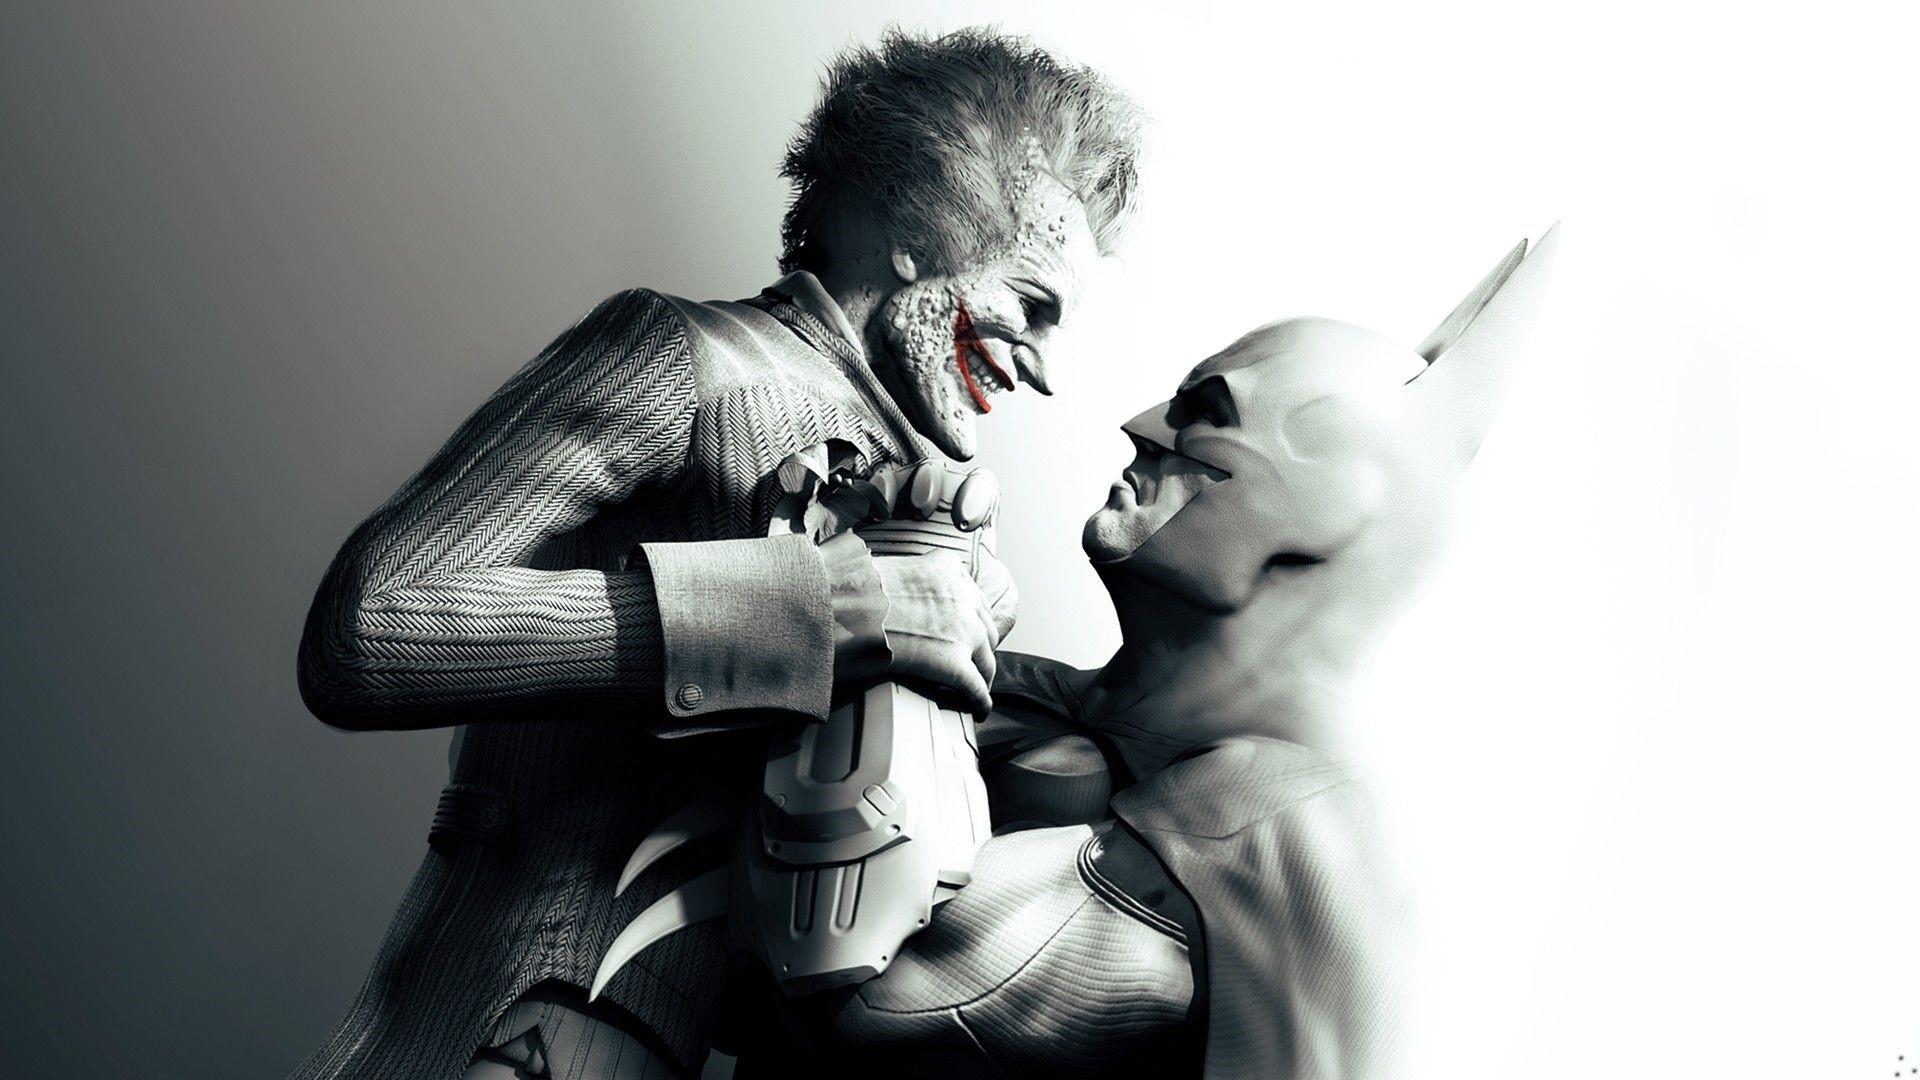 Joker Wall Background